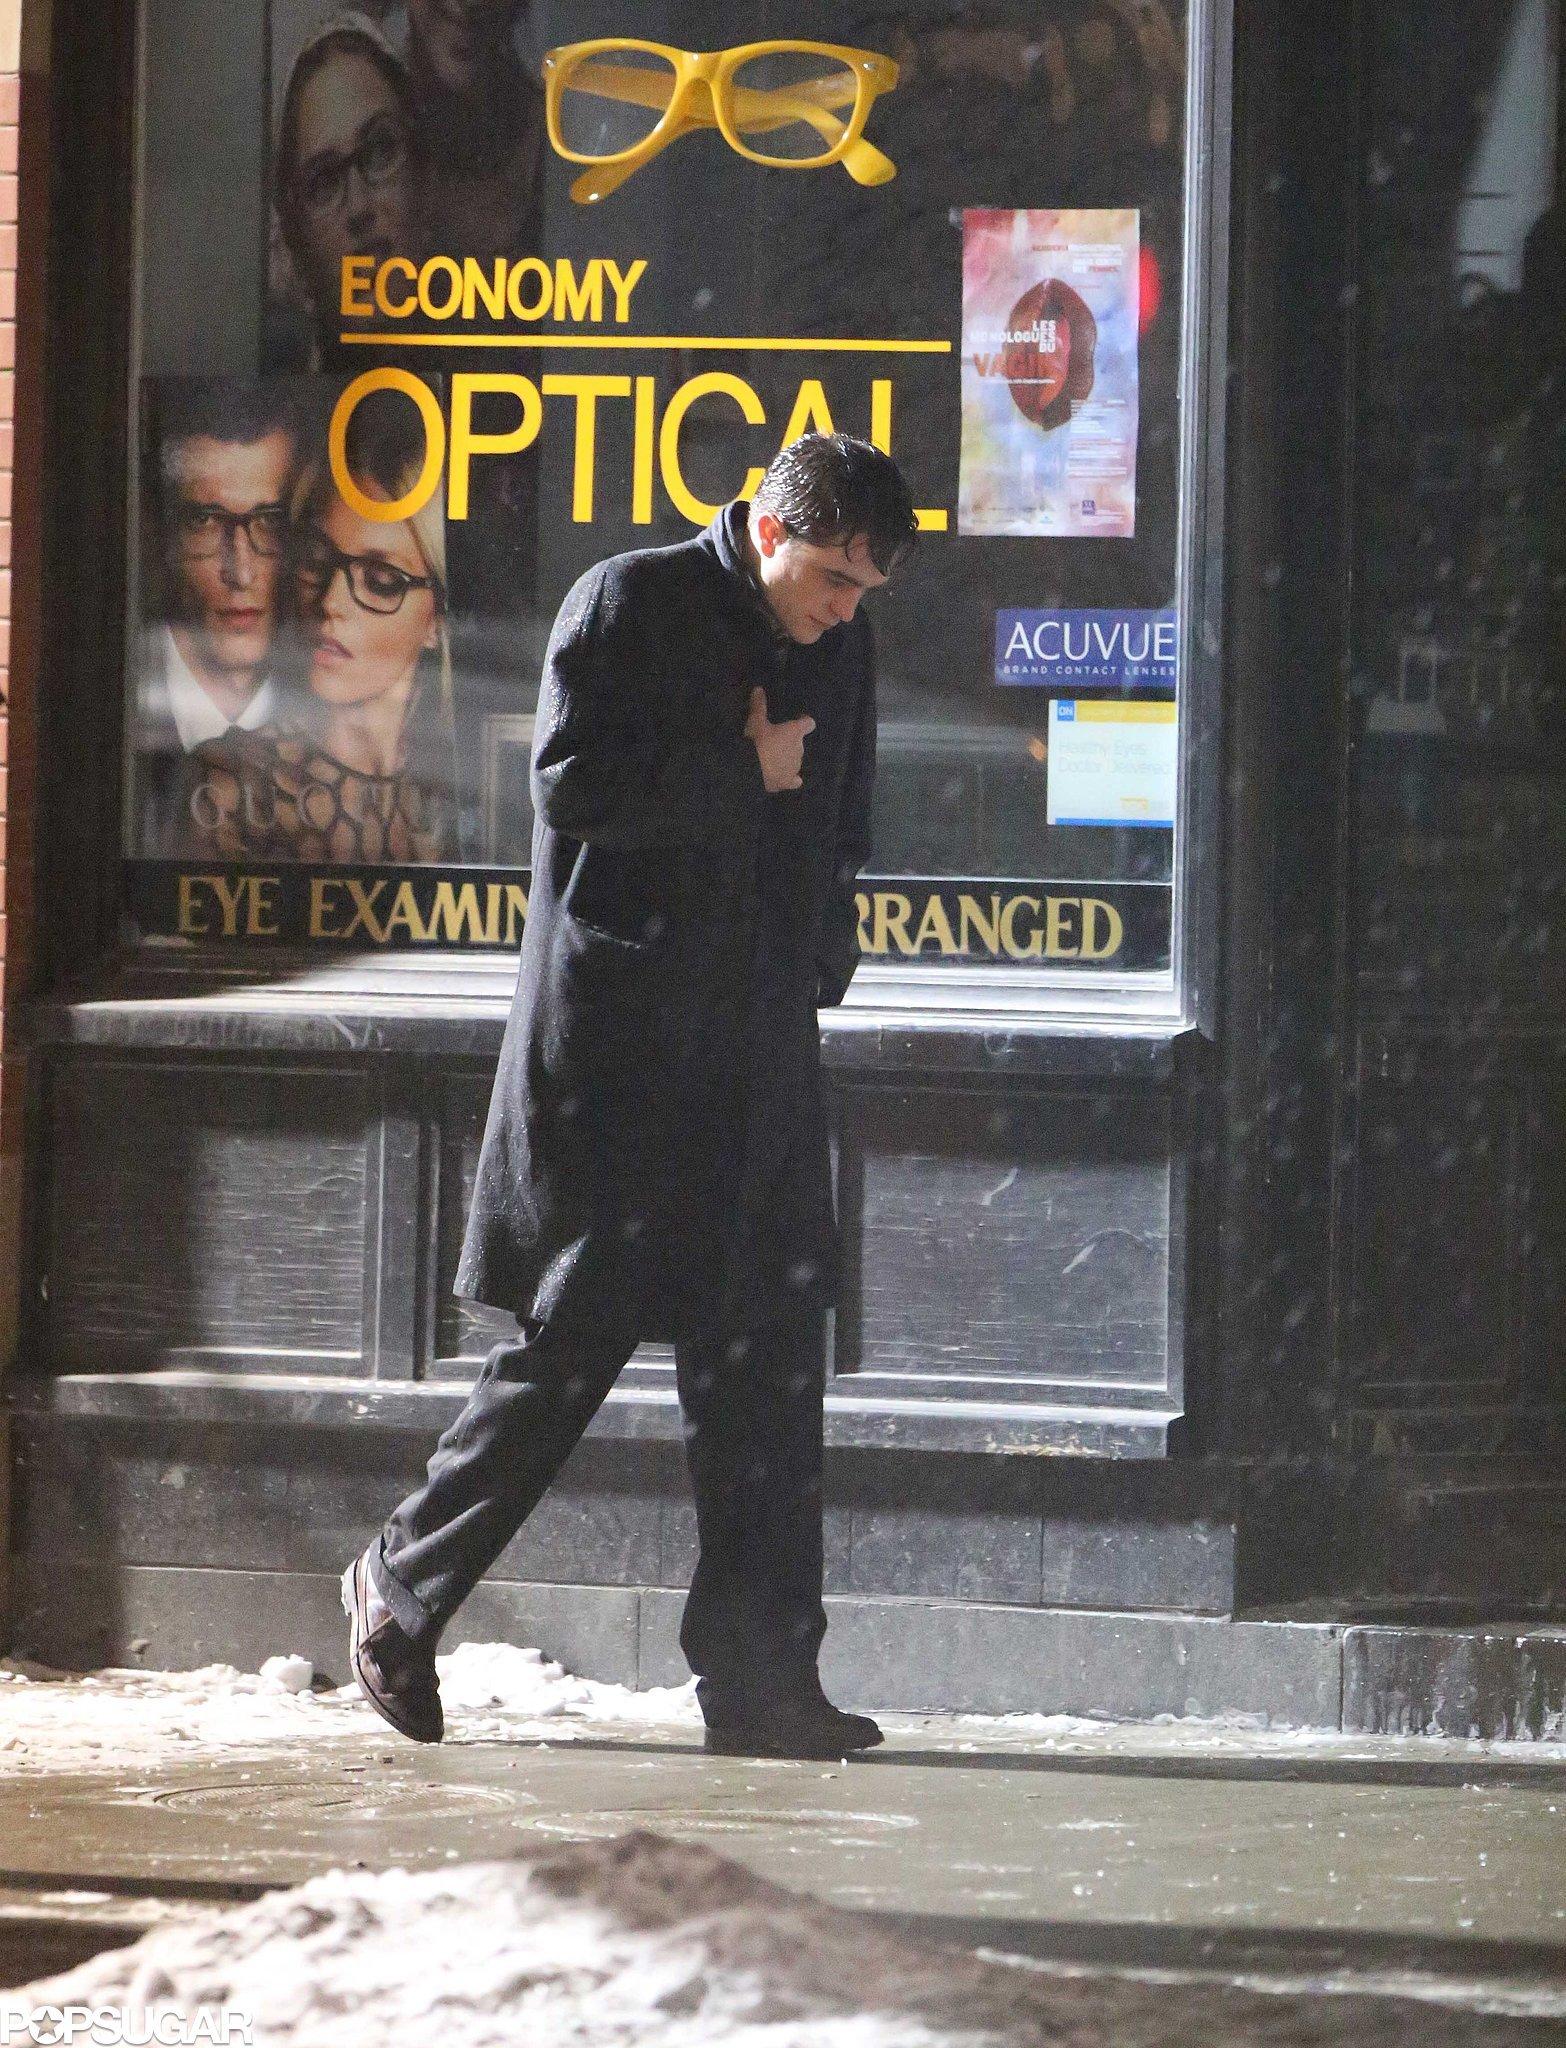 Robert Pattinson Gets Emotional in the Rain